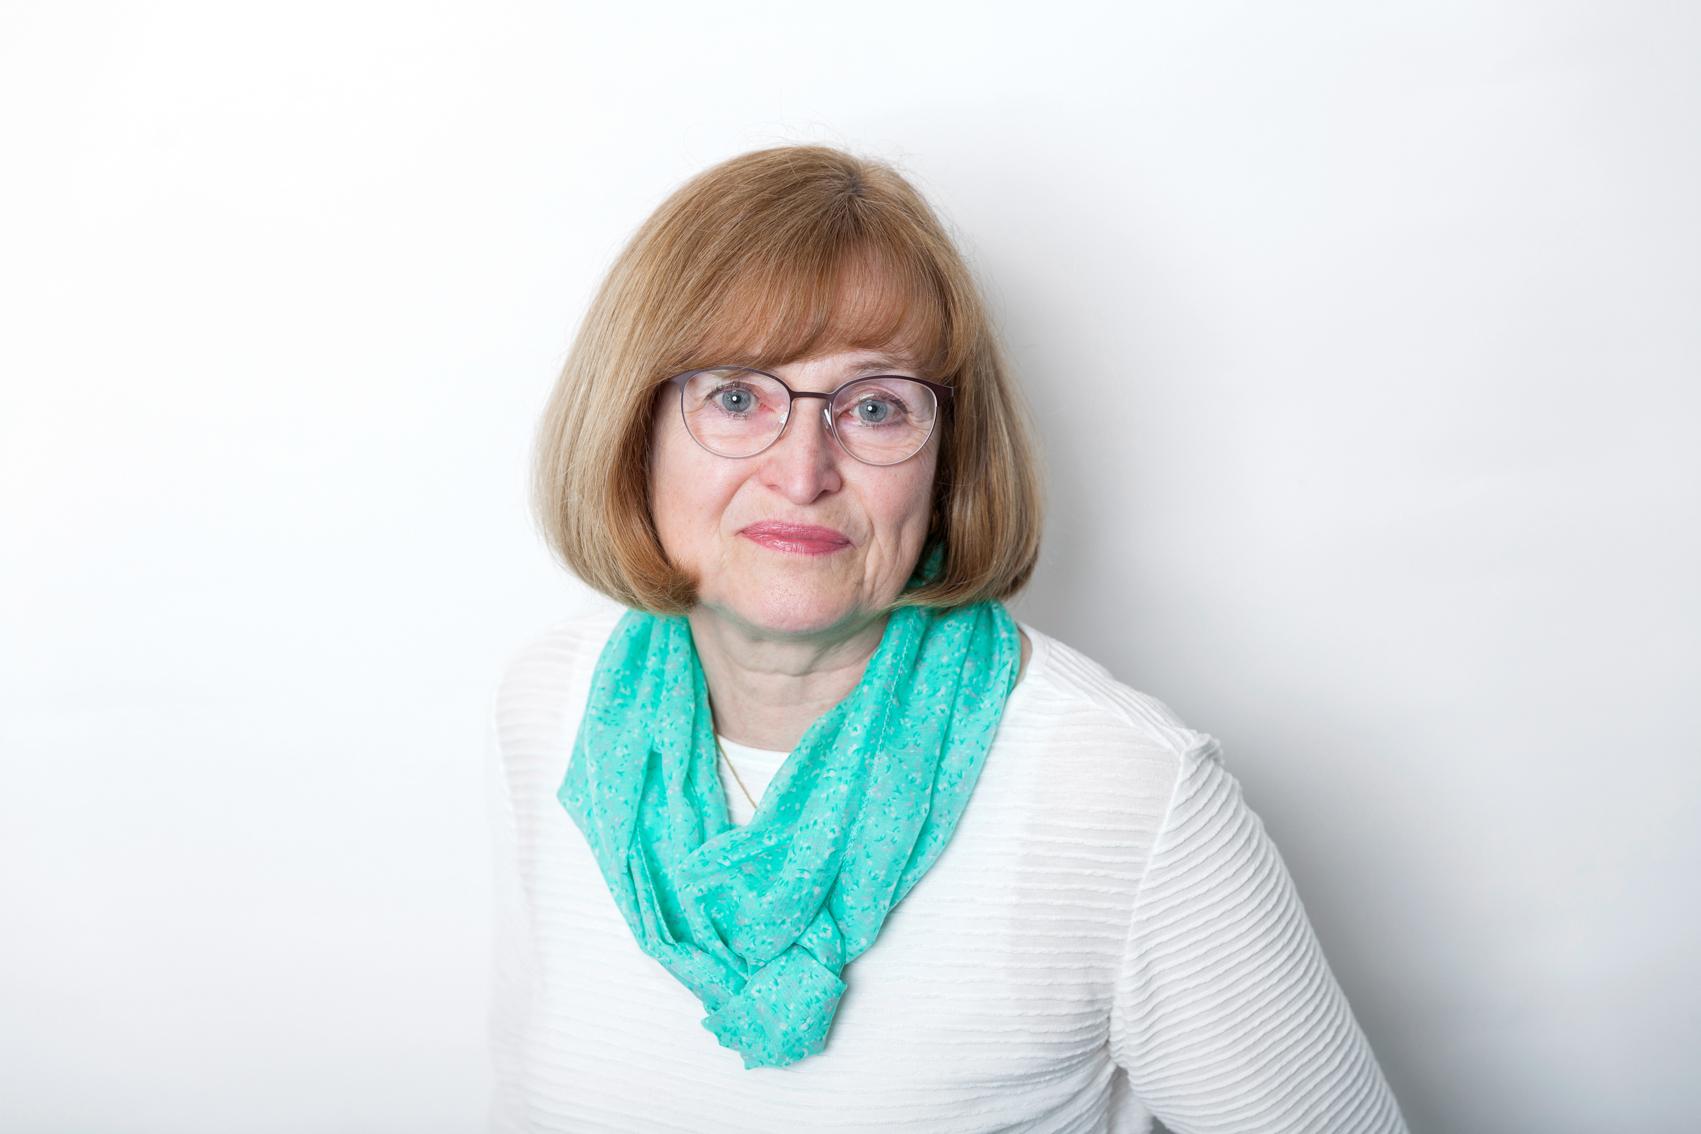 Gisela Hundt